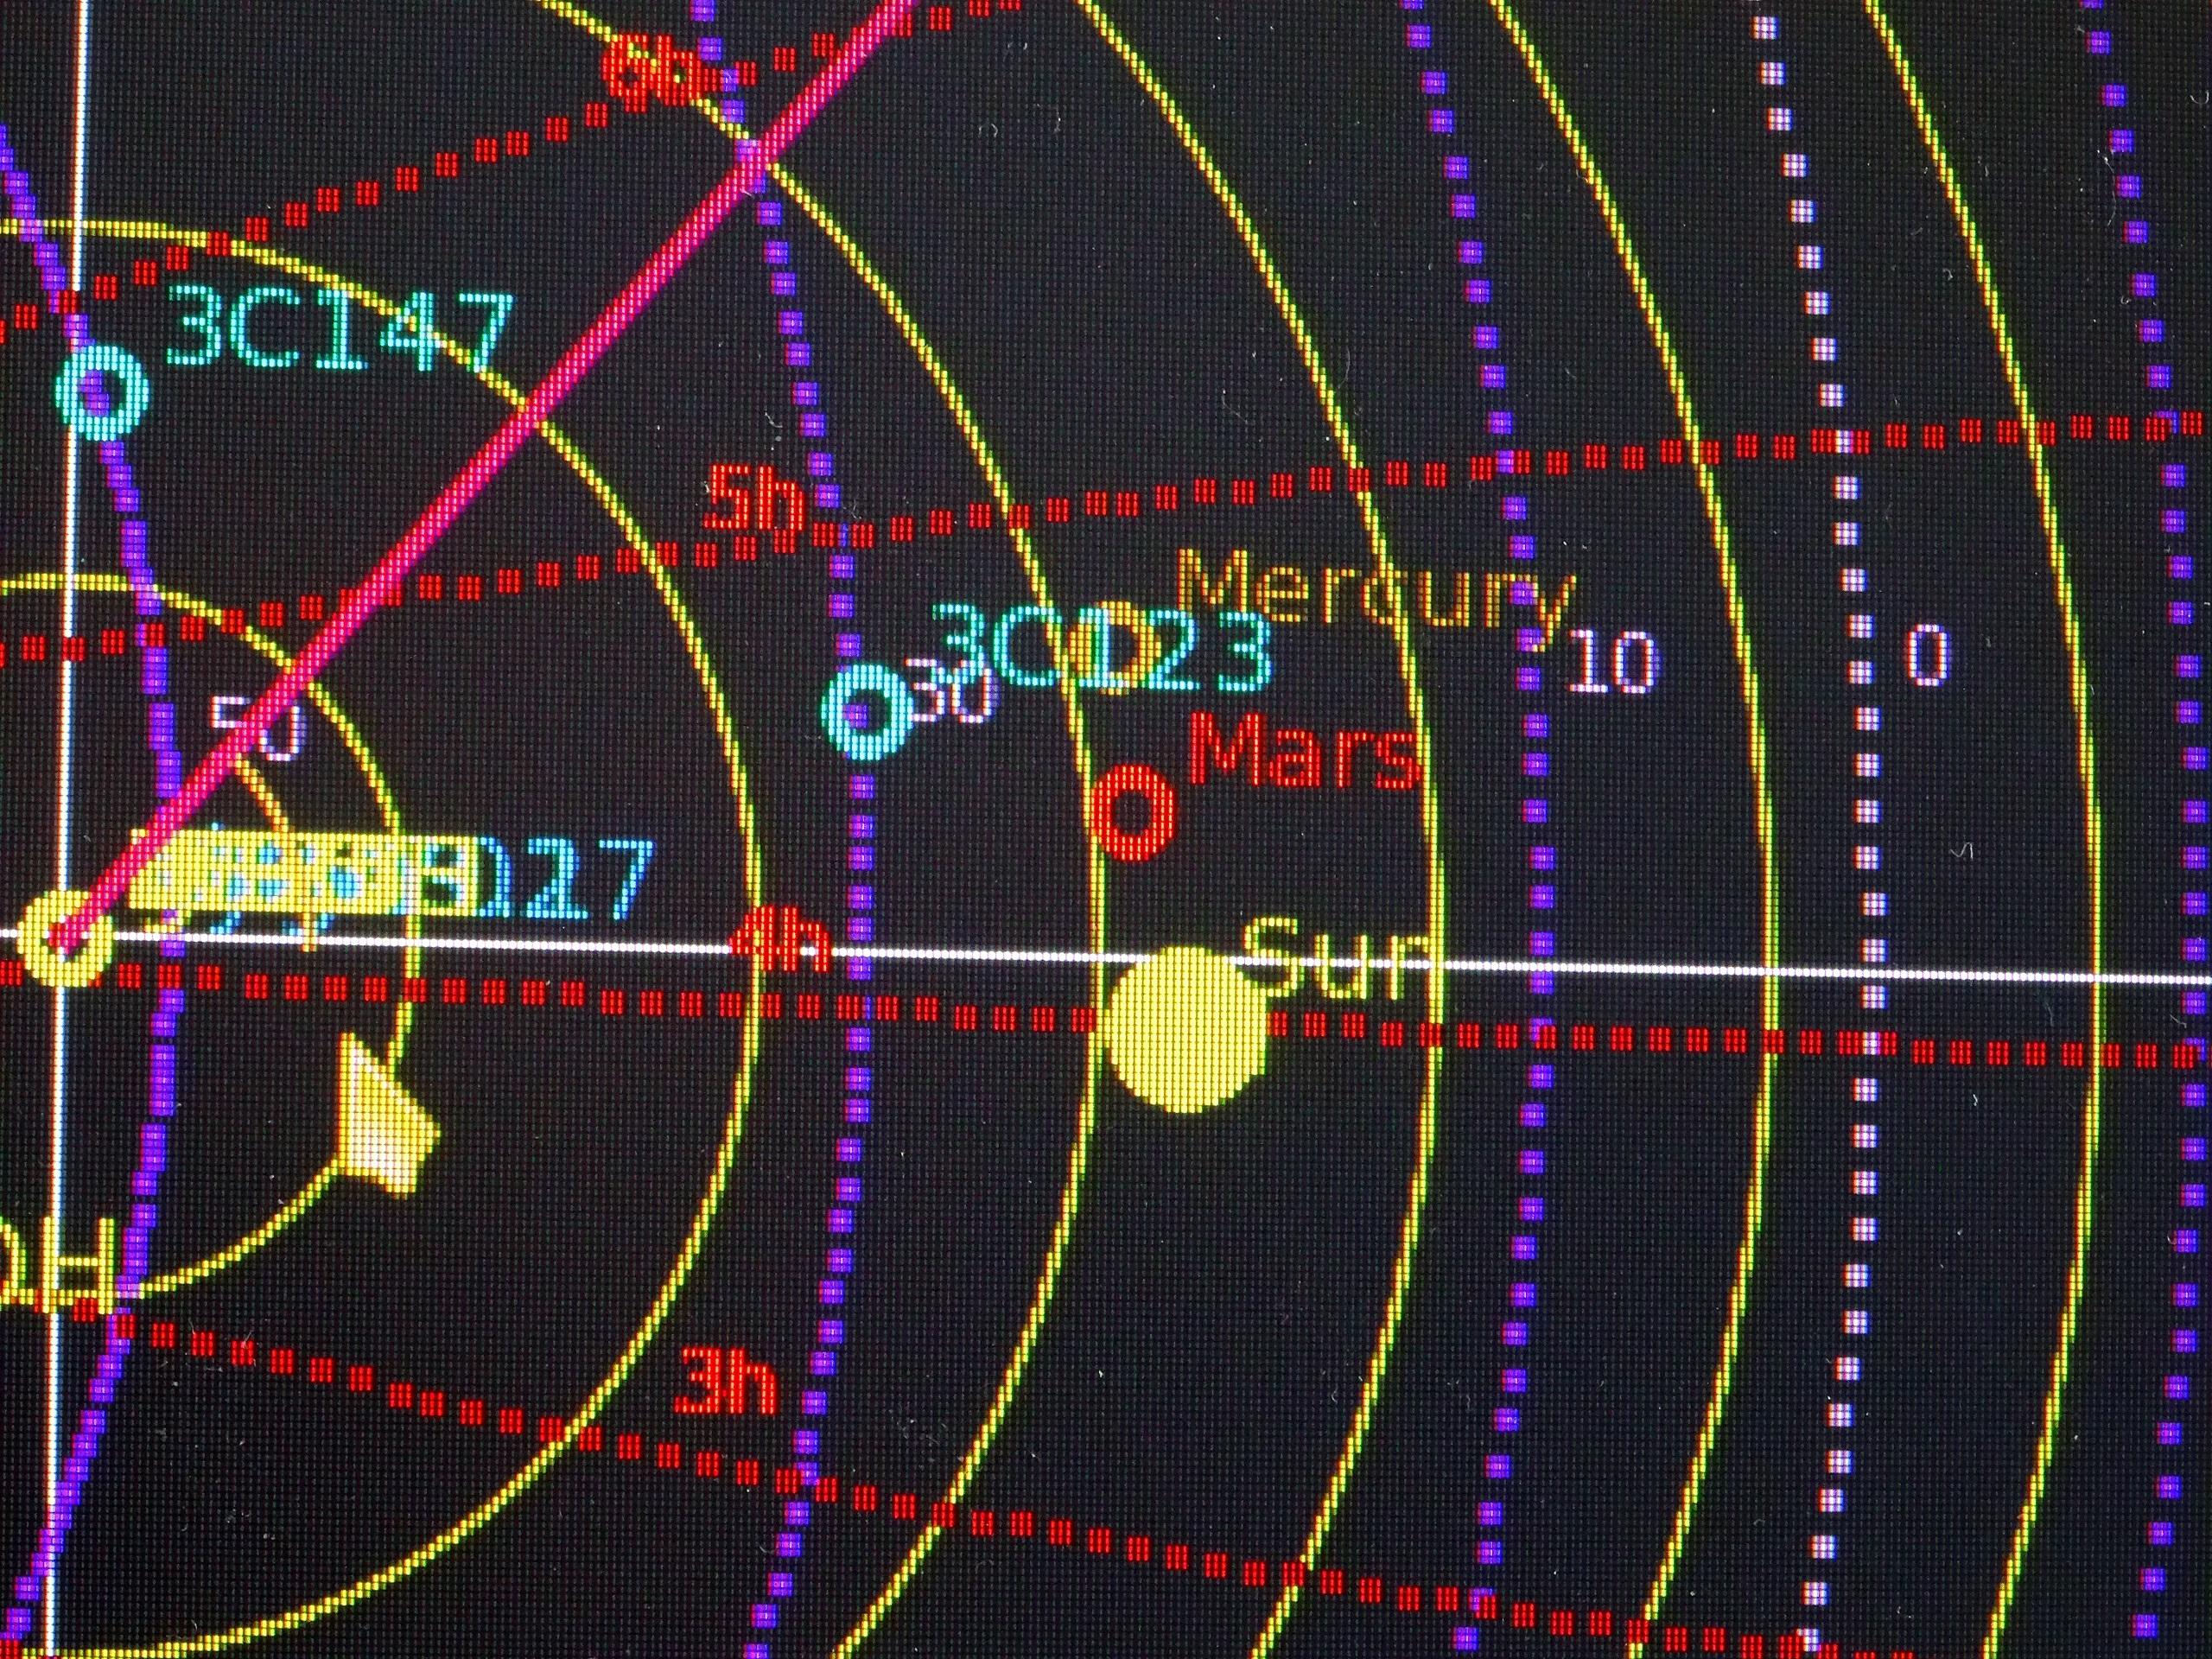 Obserwatorium Astronomiczne UMK - Merkury i Mars